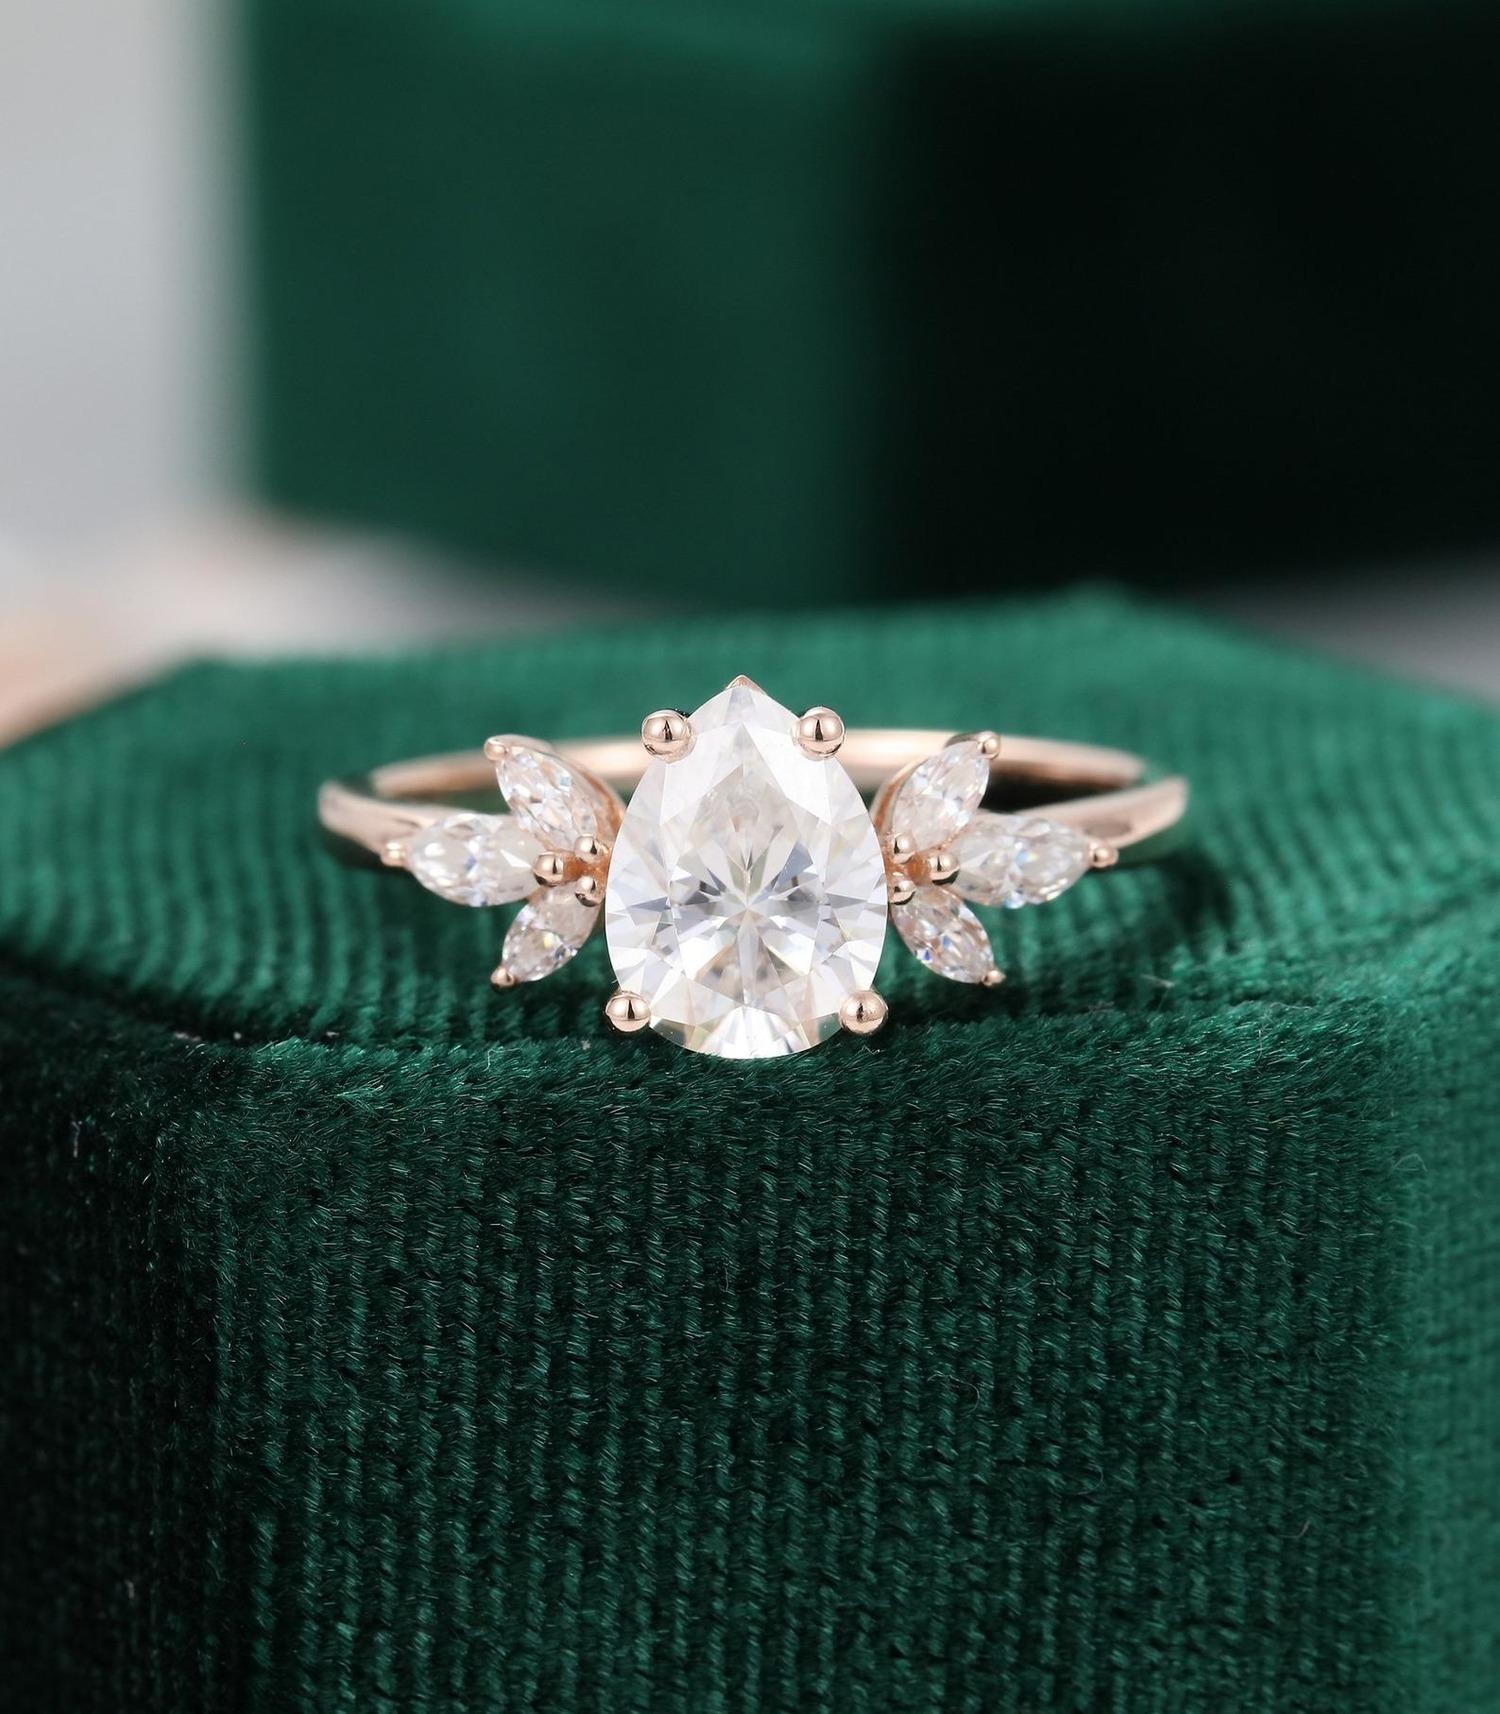 moissanite vs diamond delicate floral pear shaped band